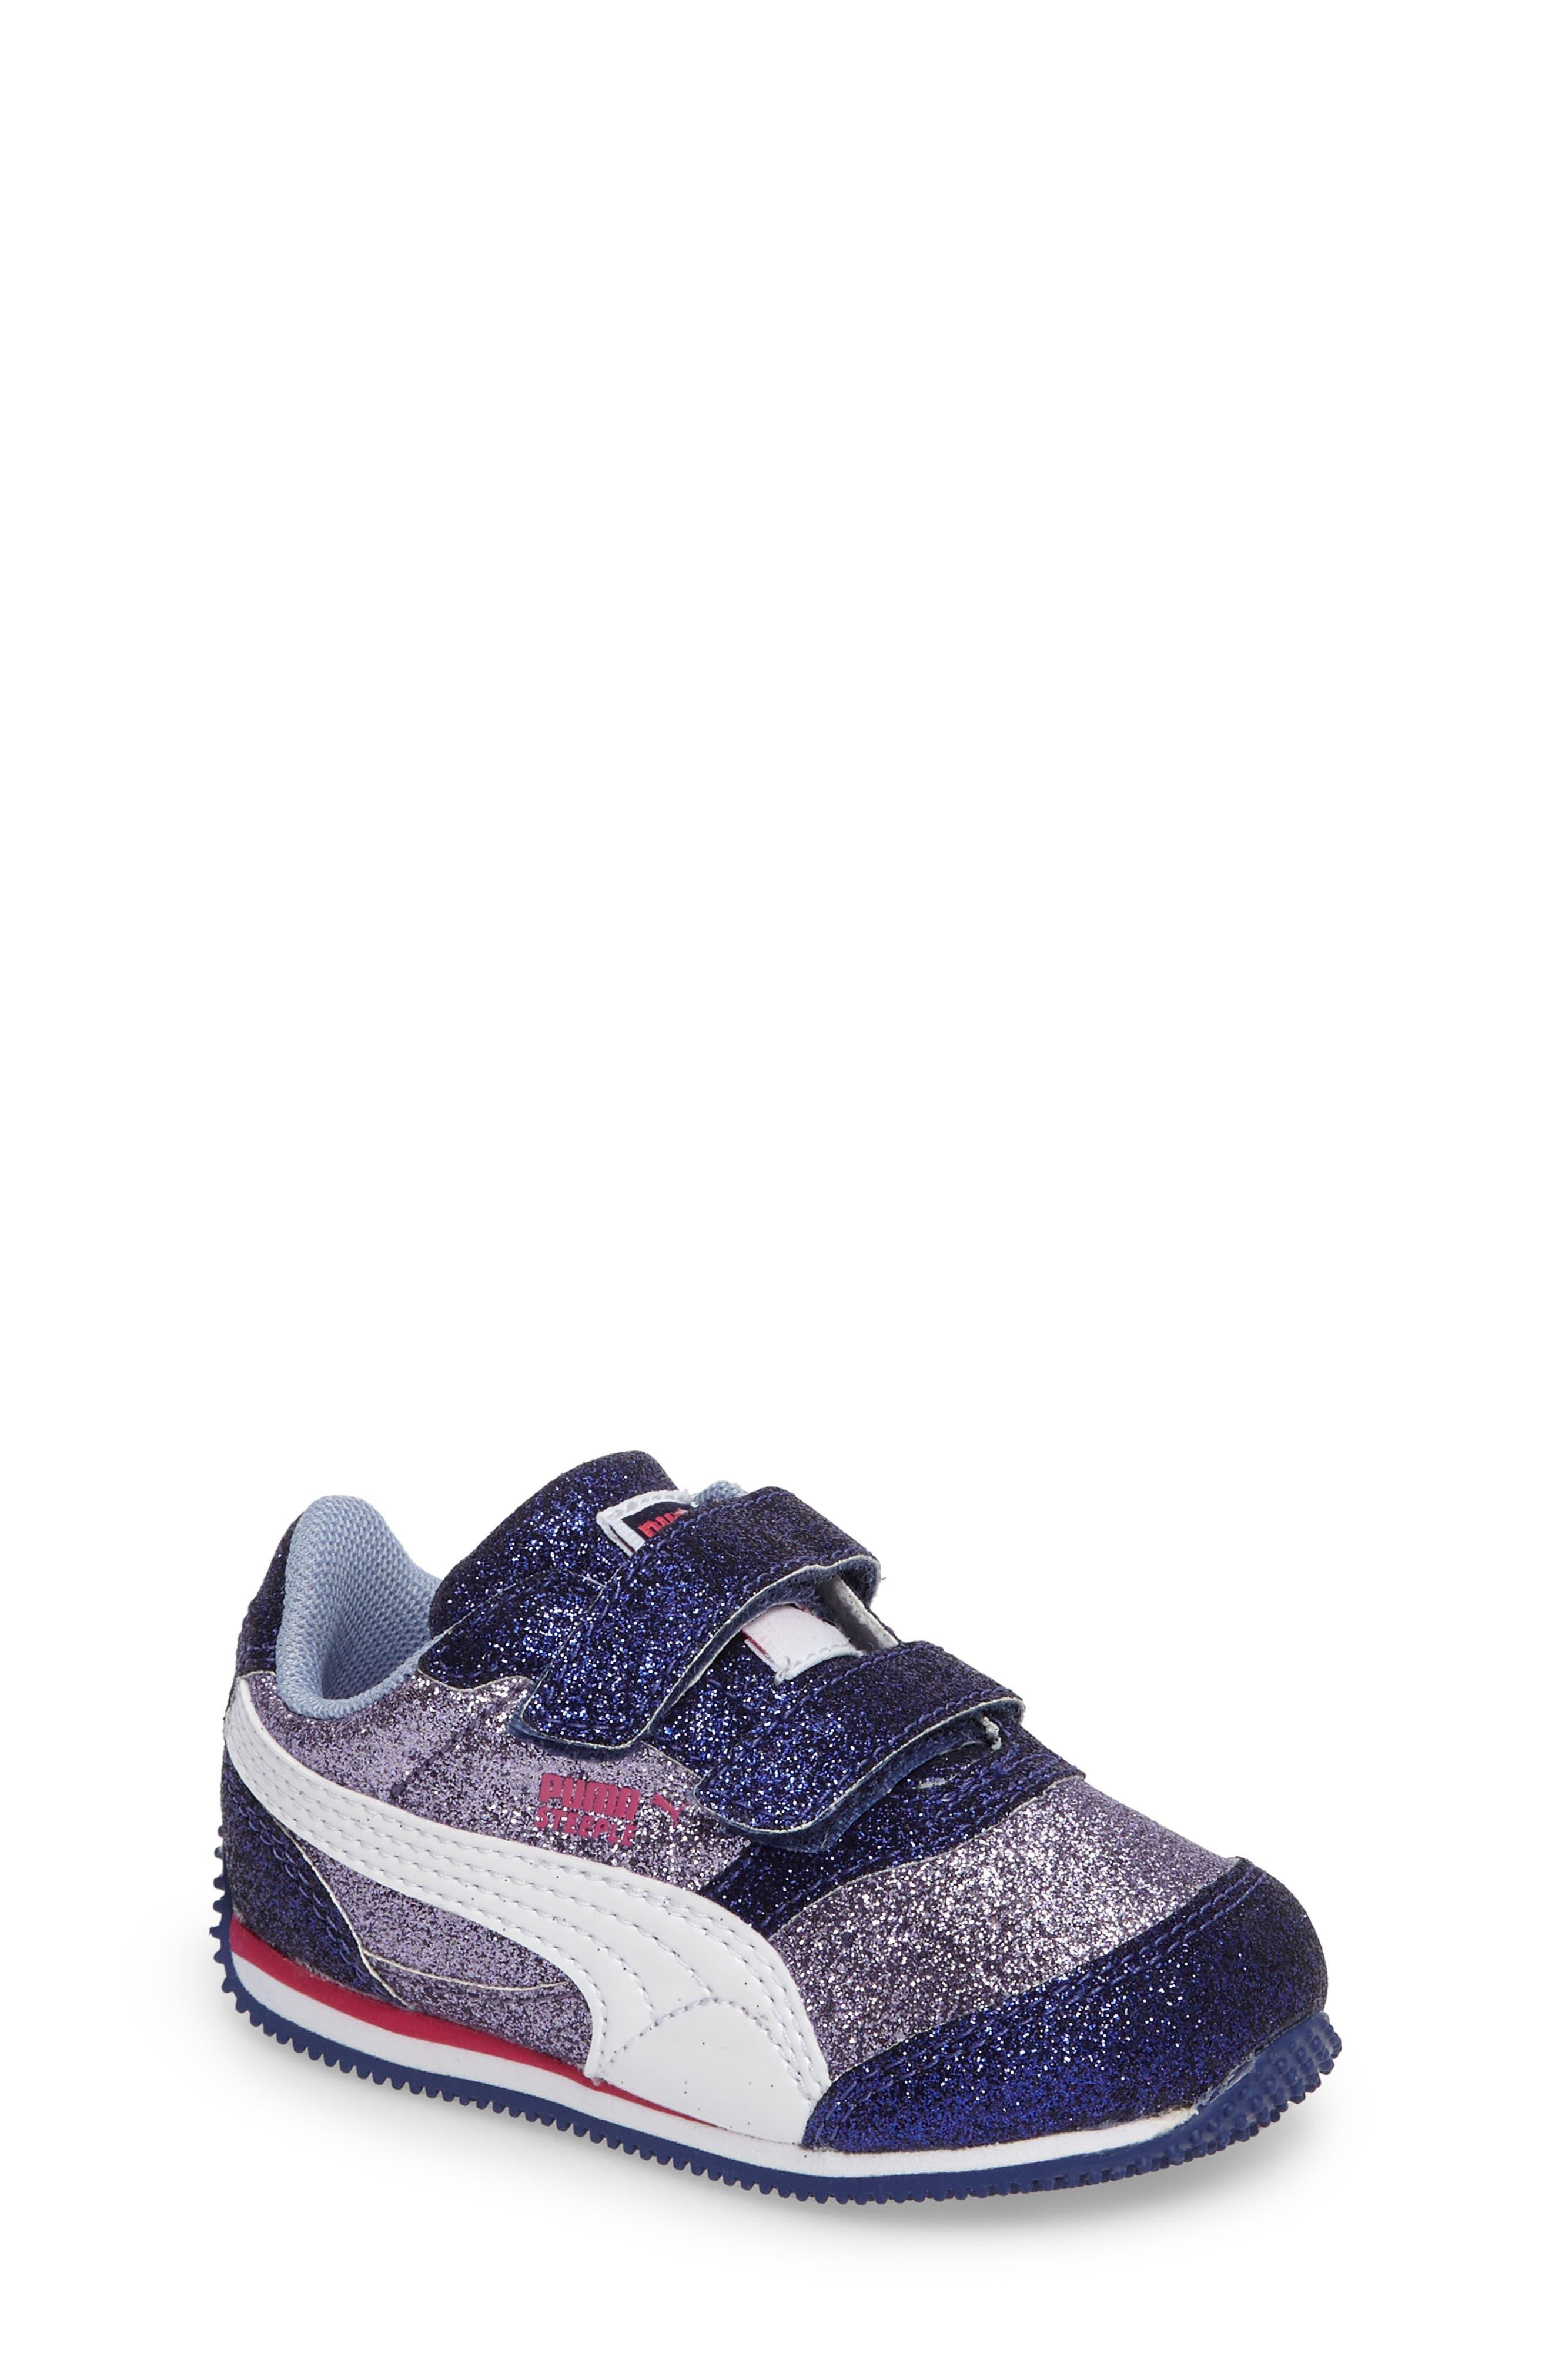 Steeple Glitz Glam Sneaker,                             Main thumbnail 1, color,                             500